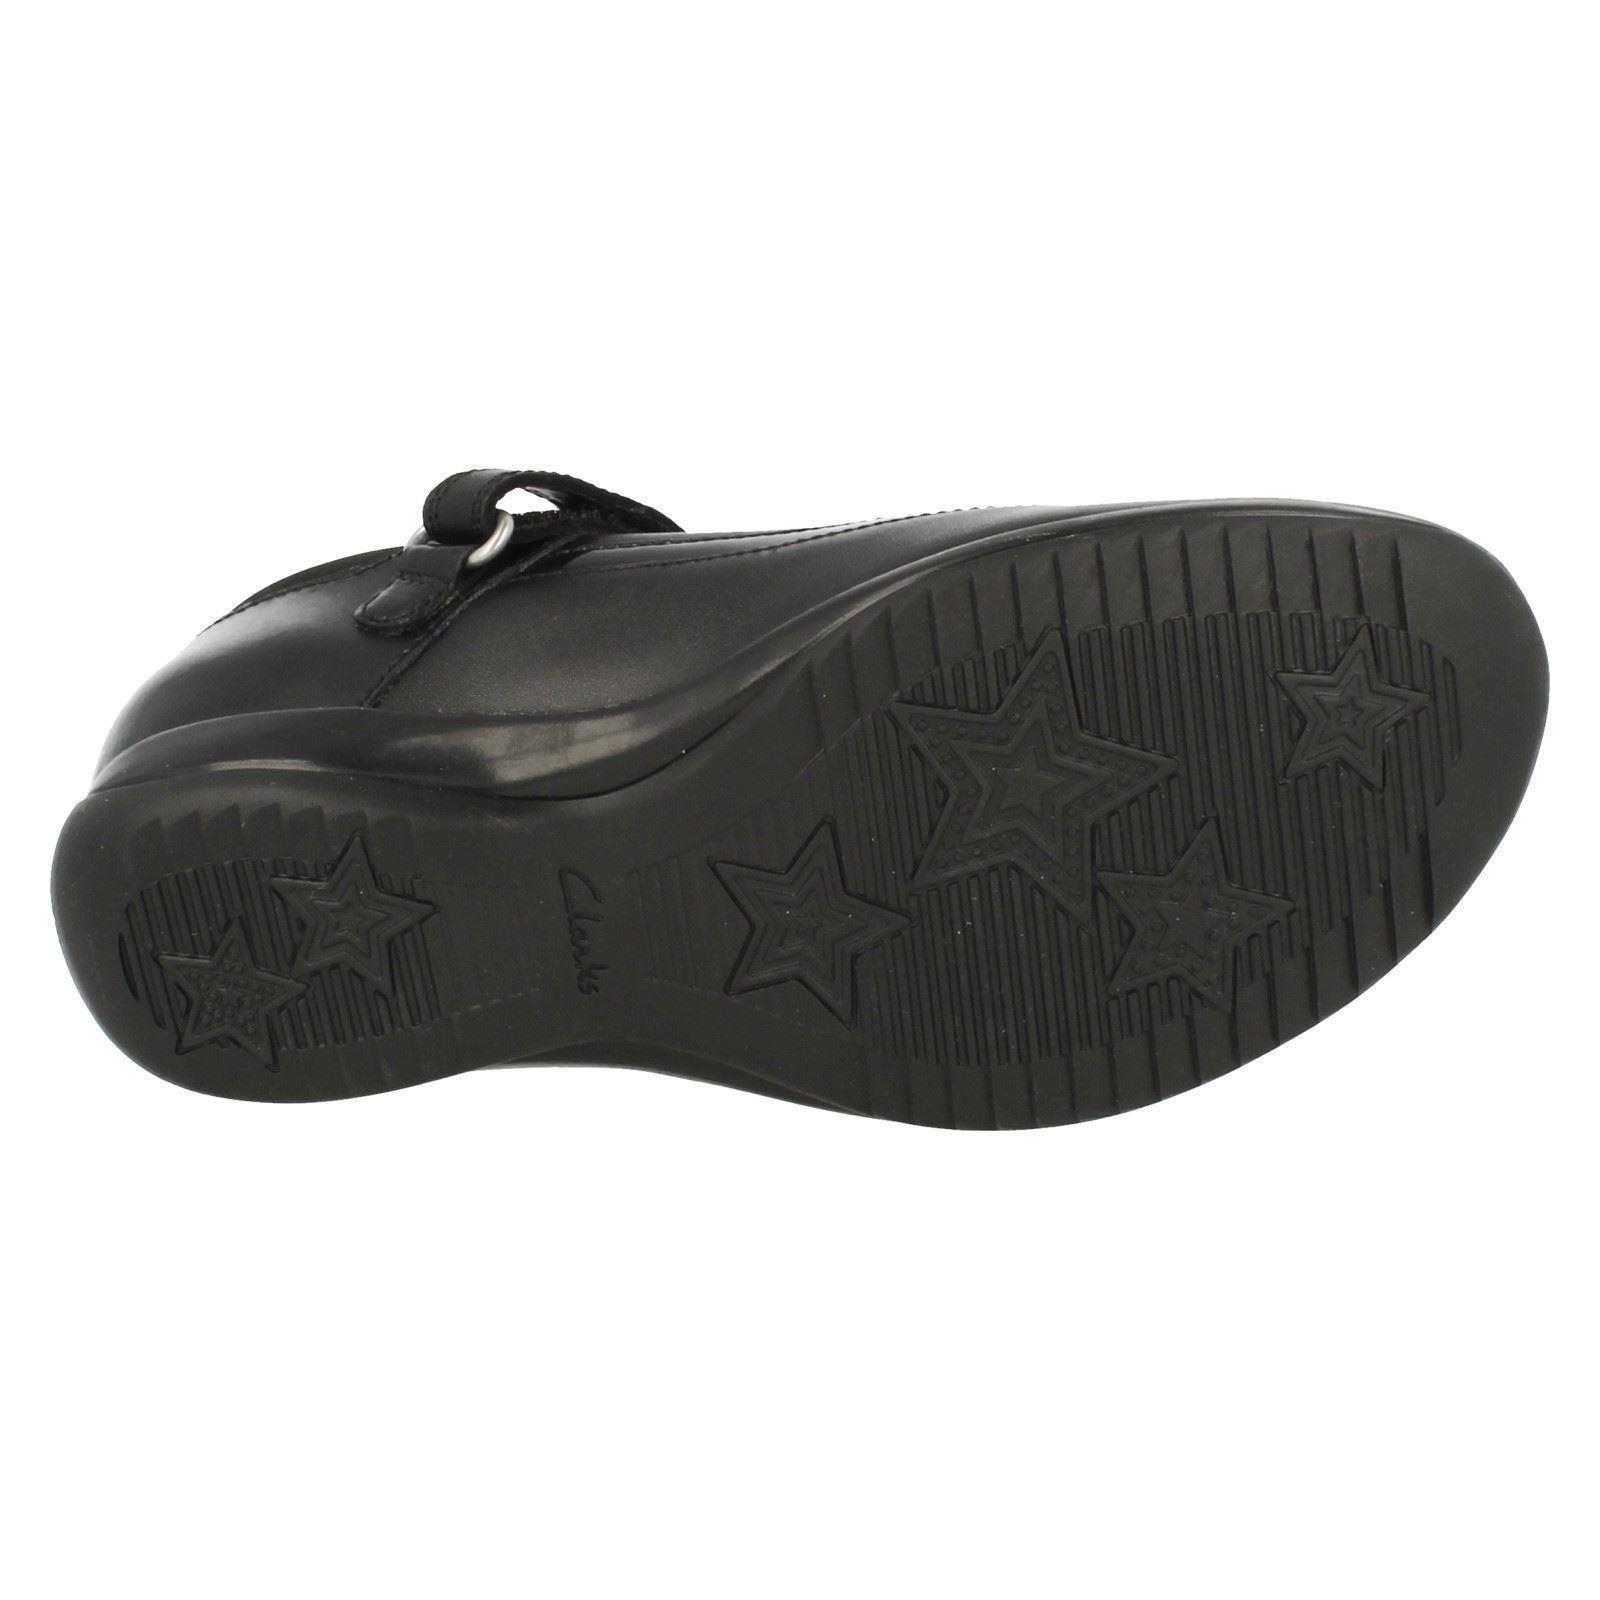 Girls Clarks Hook & Loop Rounded Toe Hidden Toy School Shoes Daisy Locket